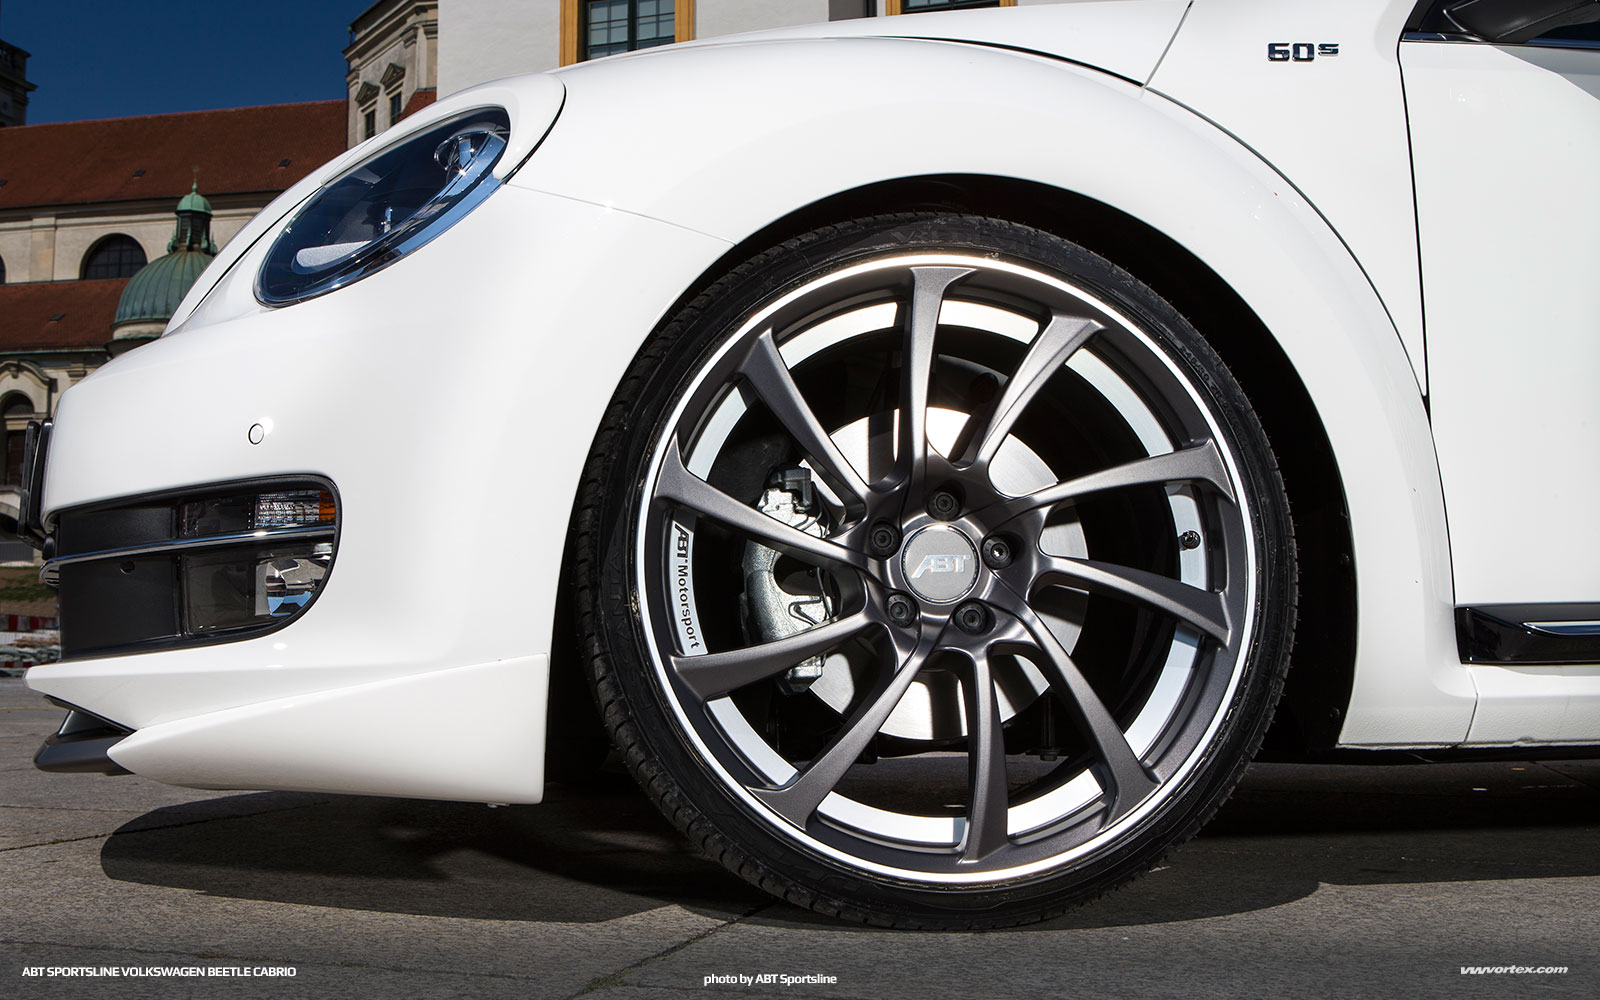 ABT-Sportsline-Volkswagen-Beetle-Cabrio-366